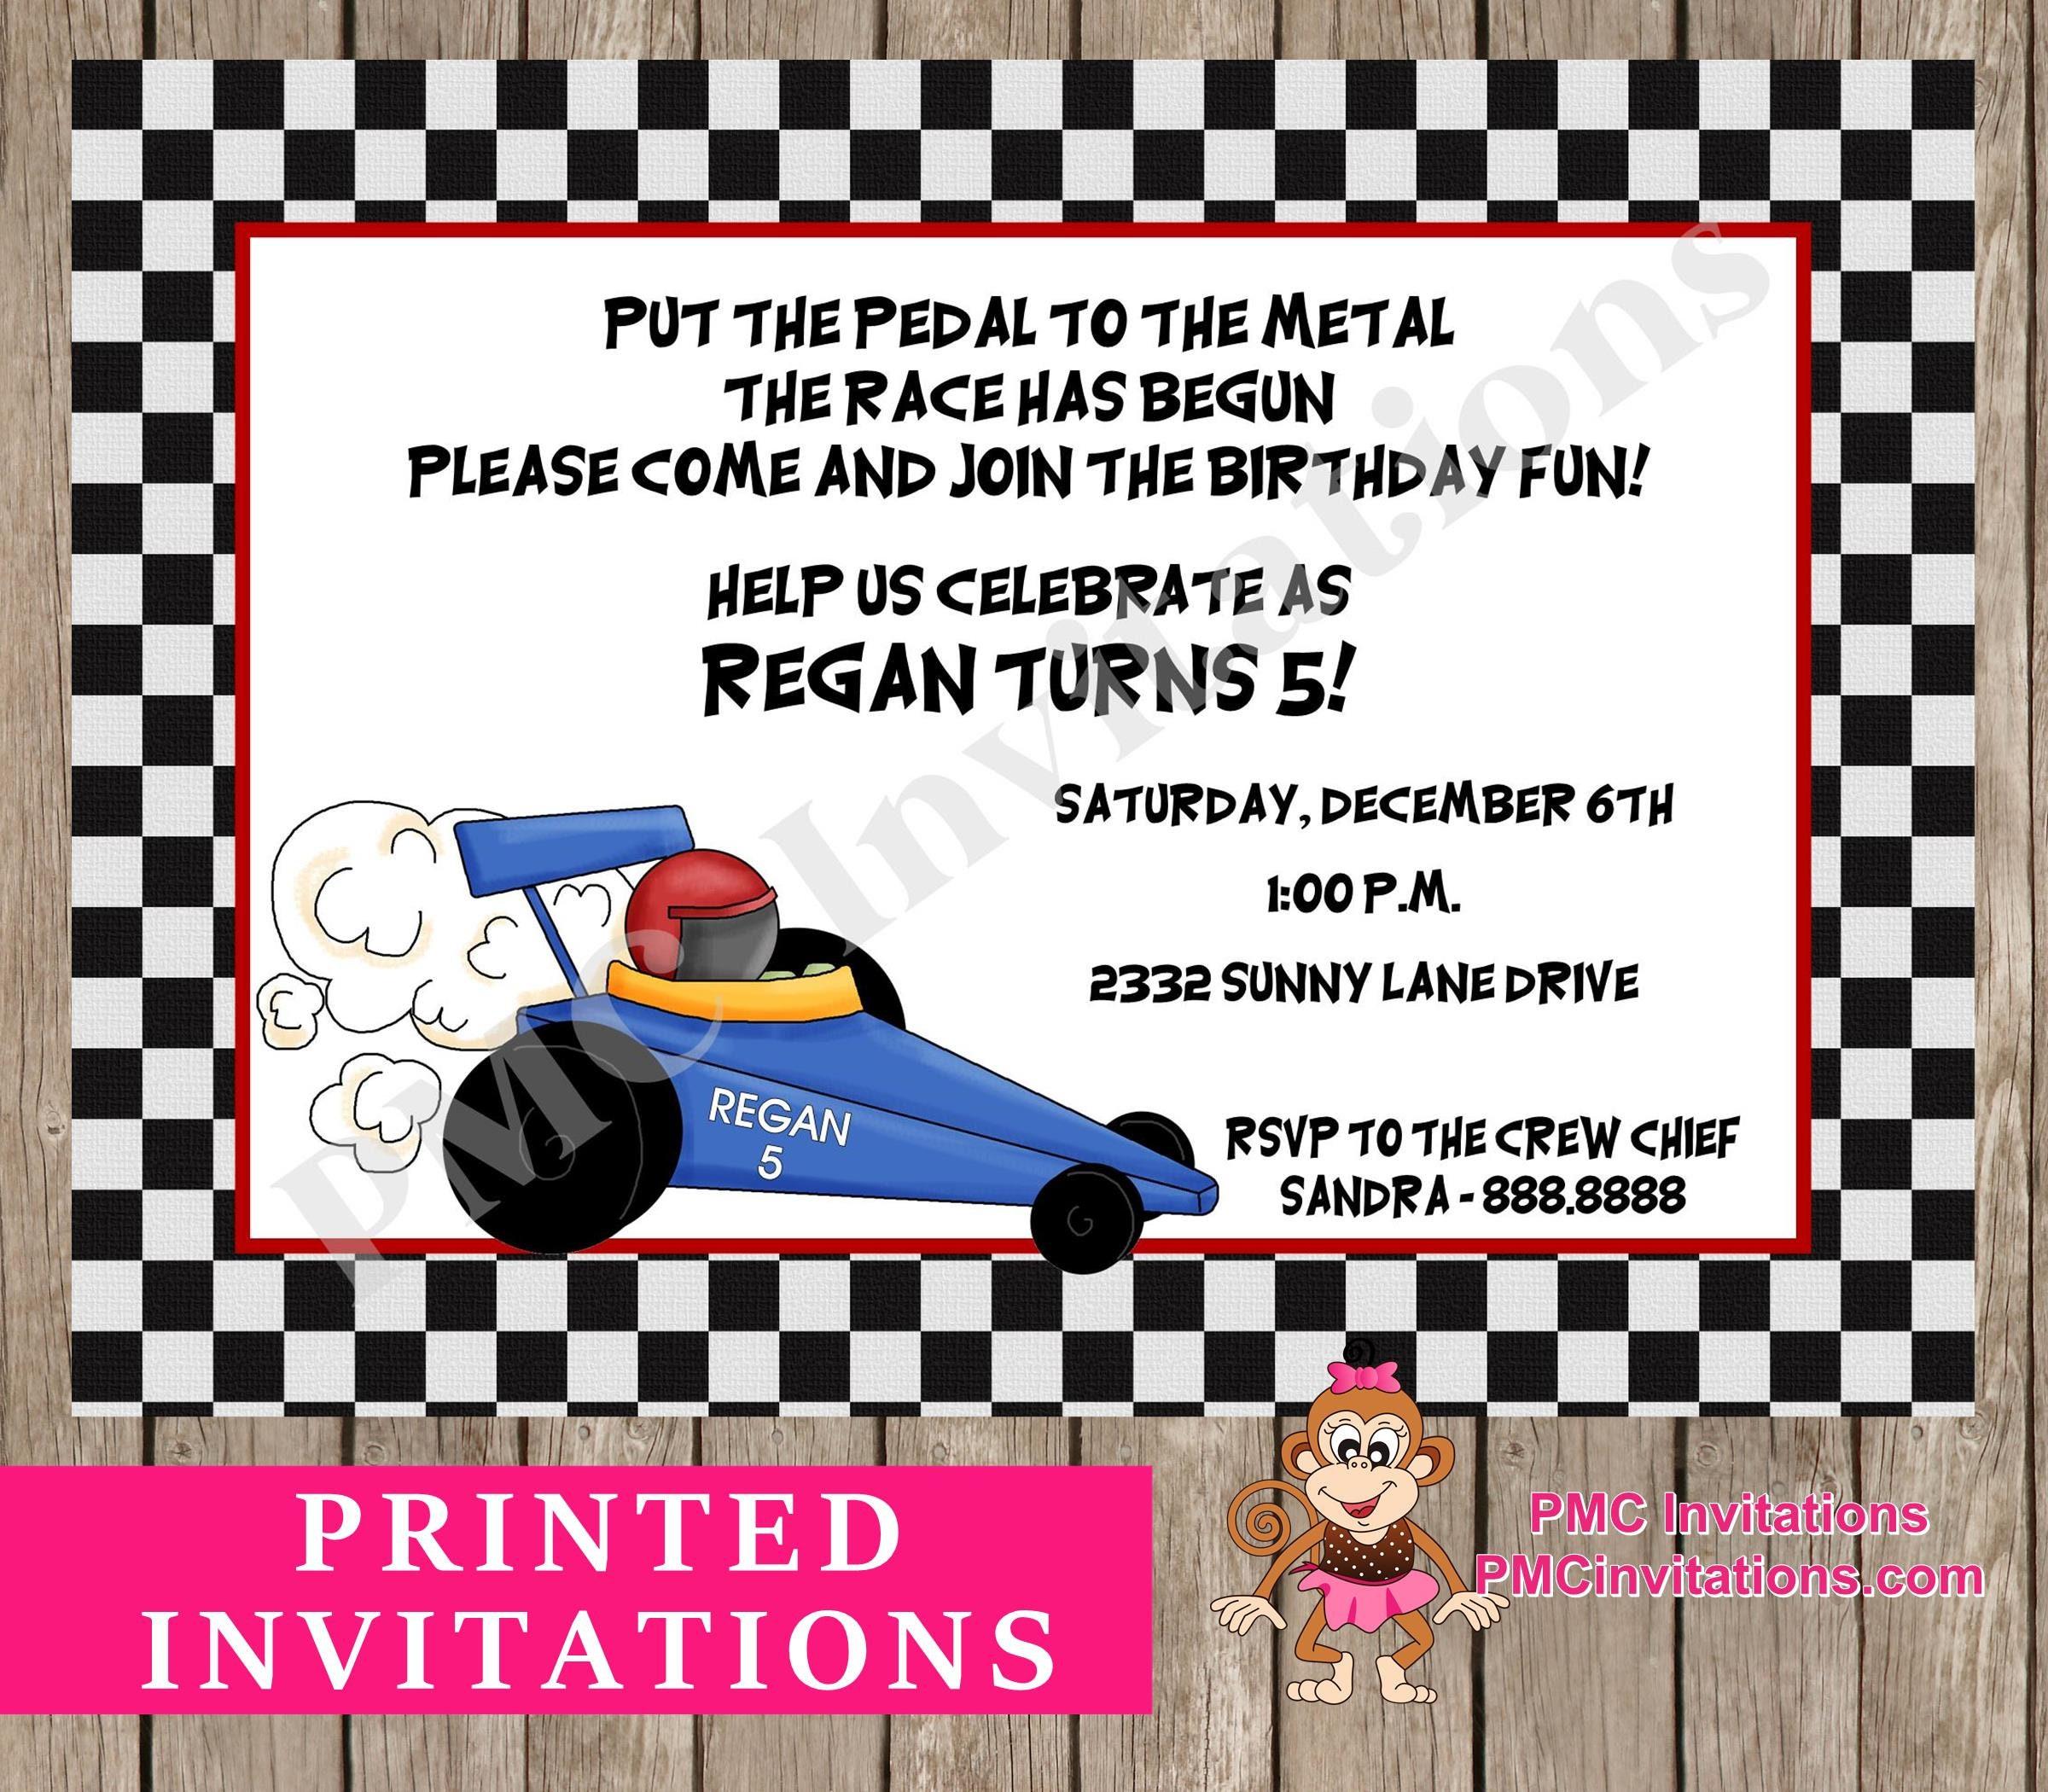 Custom Printed Race Car Go Kart Birthday Invitations 1.00 | Etsy